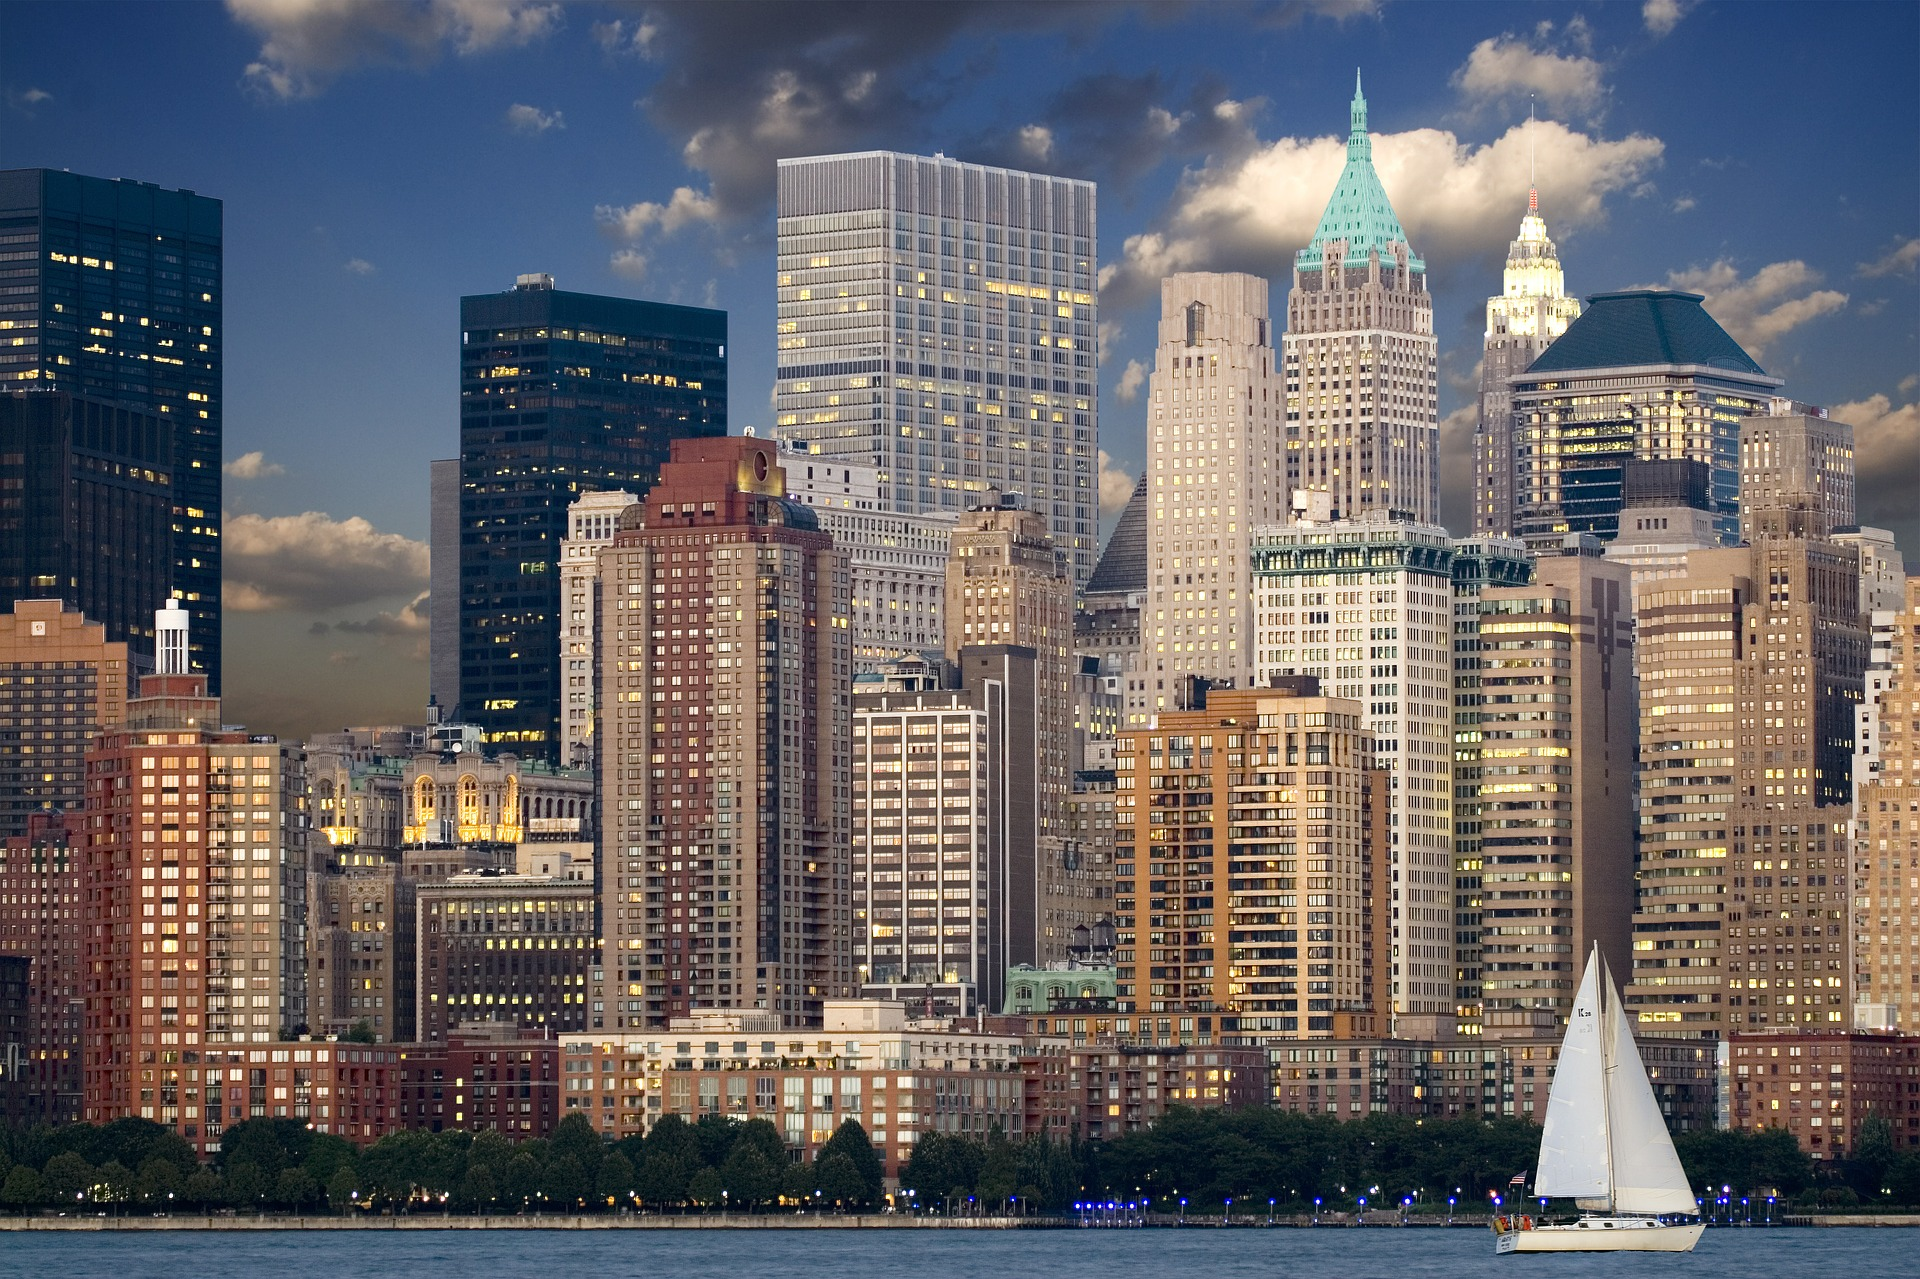 new-york-city-lit-up-from-hudson